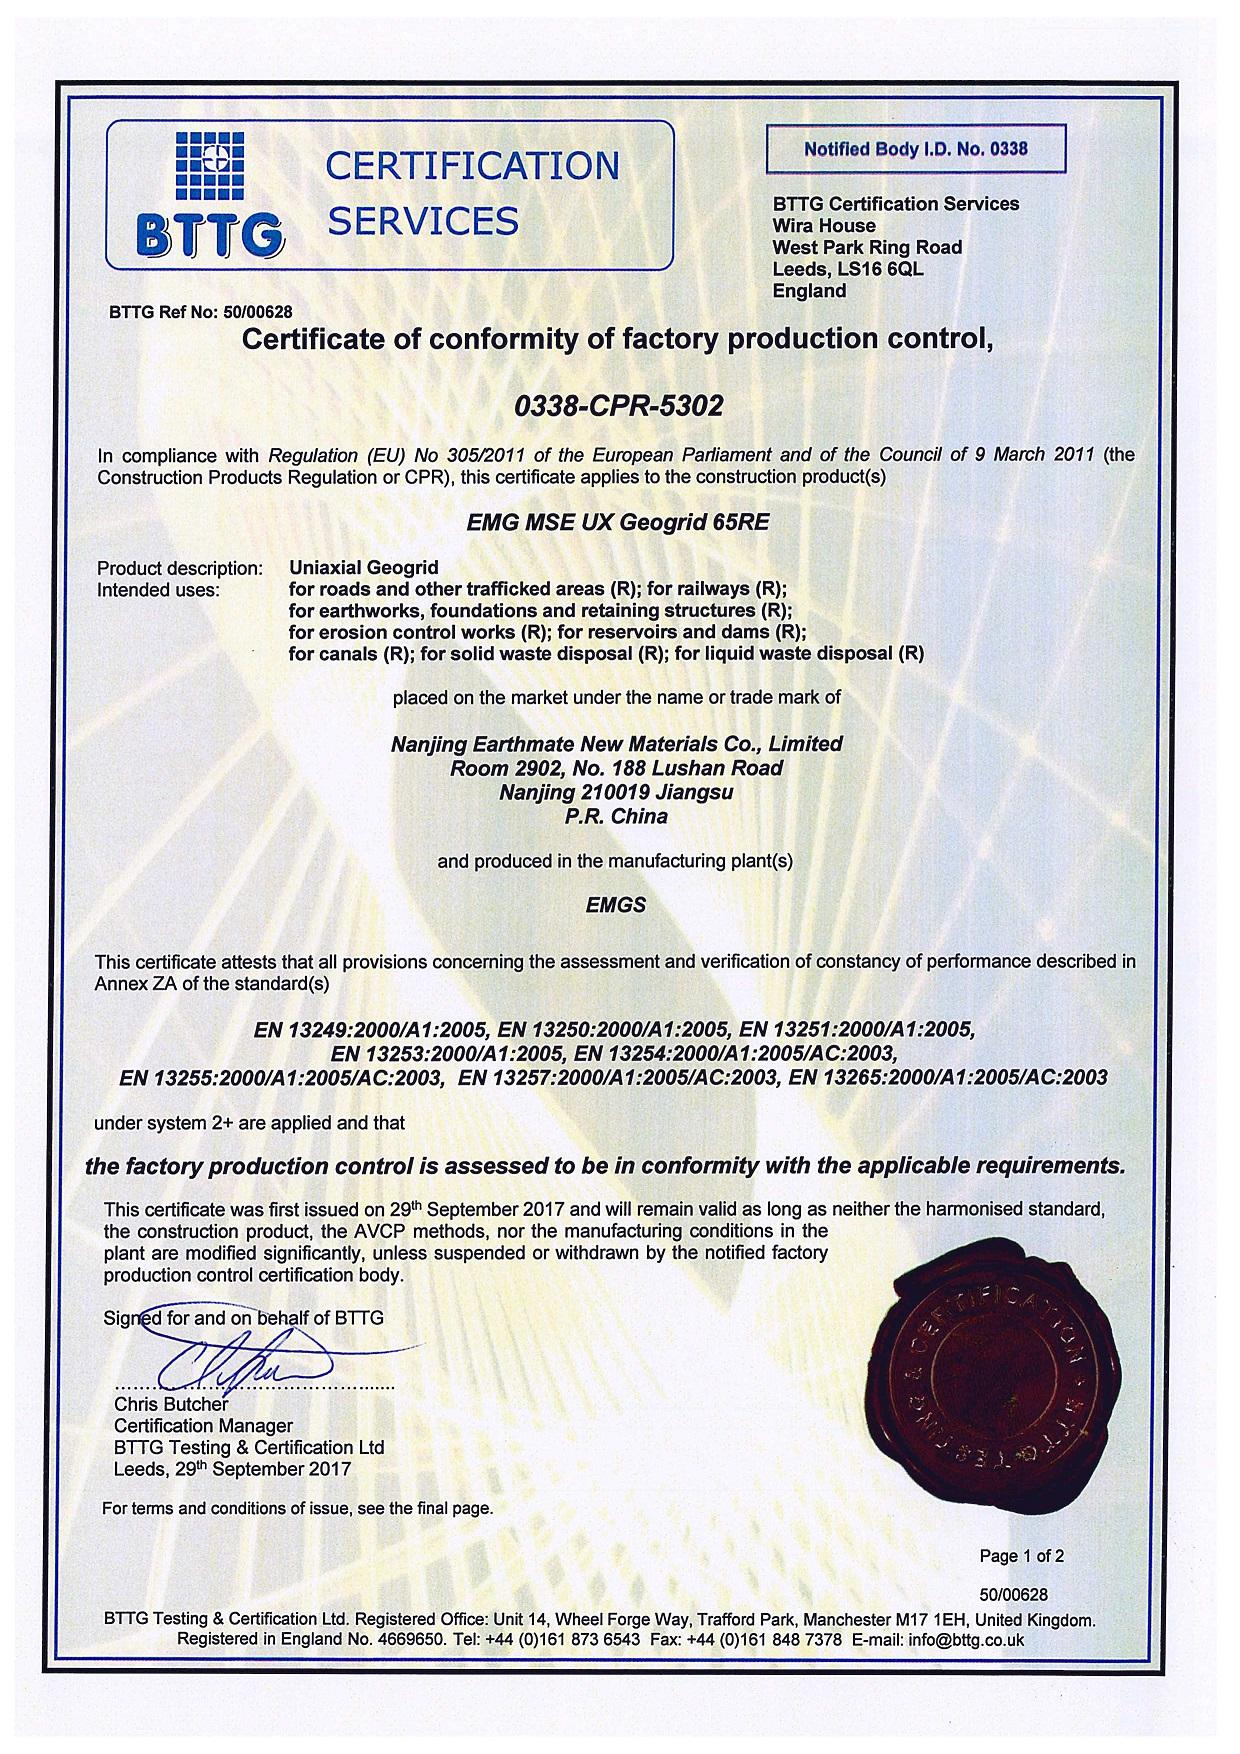 WALLSTRAIN HDPE UX Geogrids CE Certificate of Conformity|BTTG, U.K.